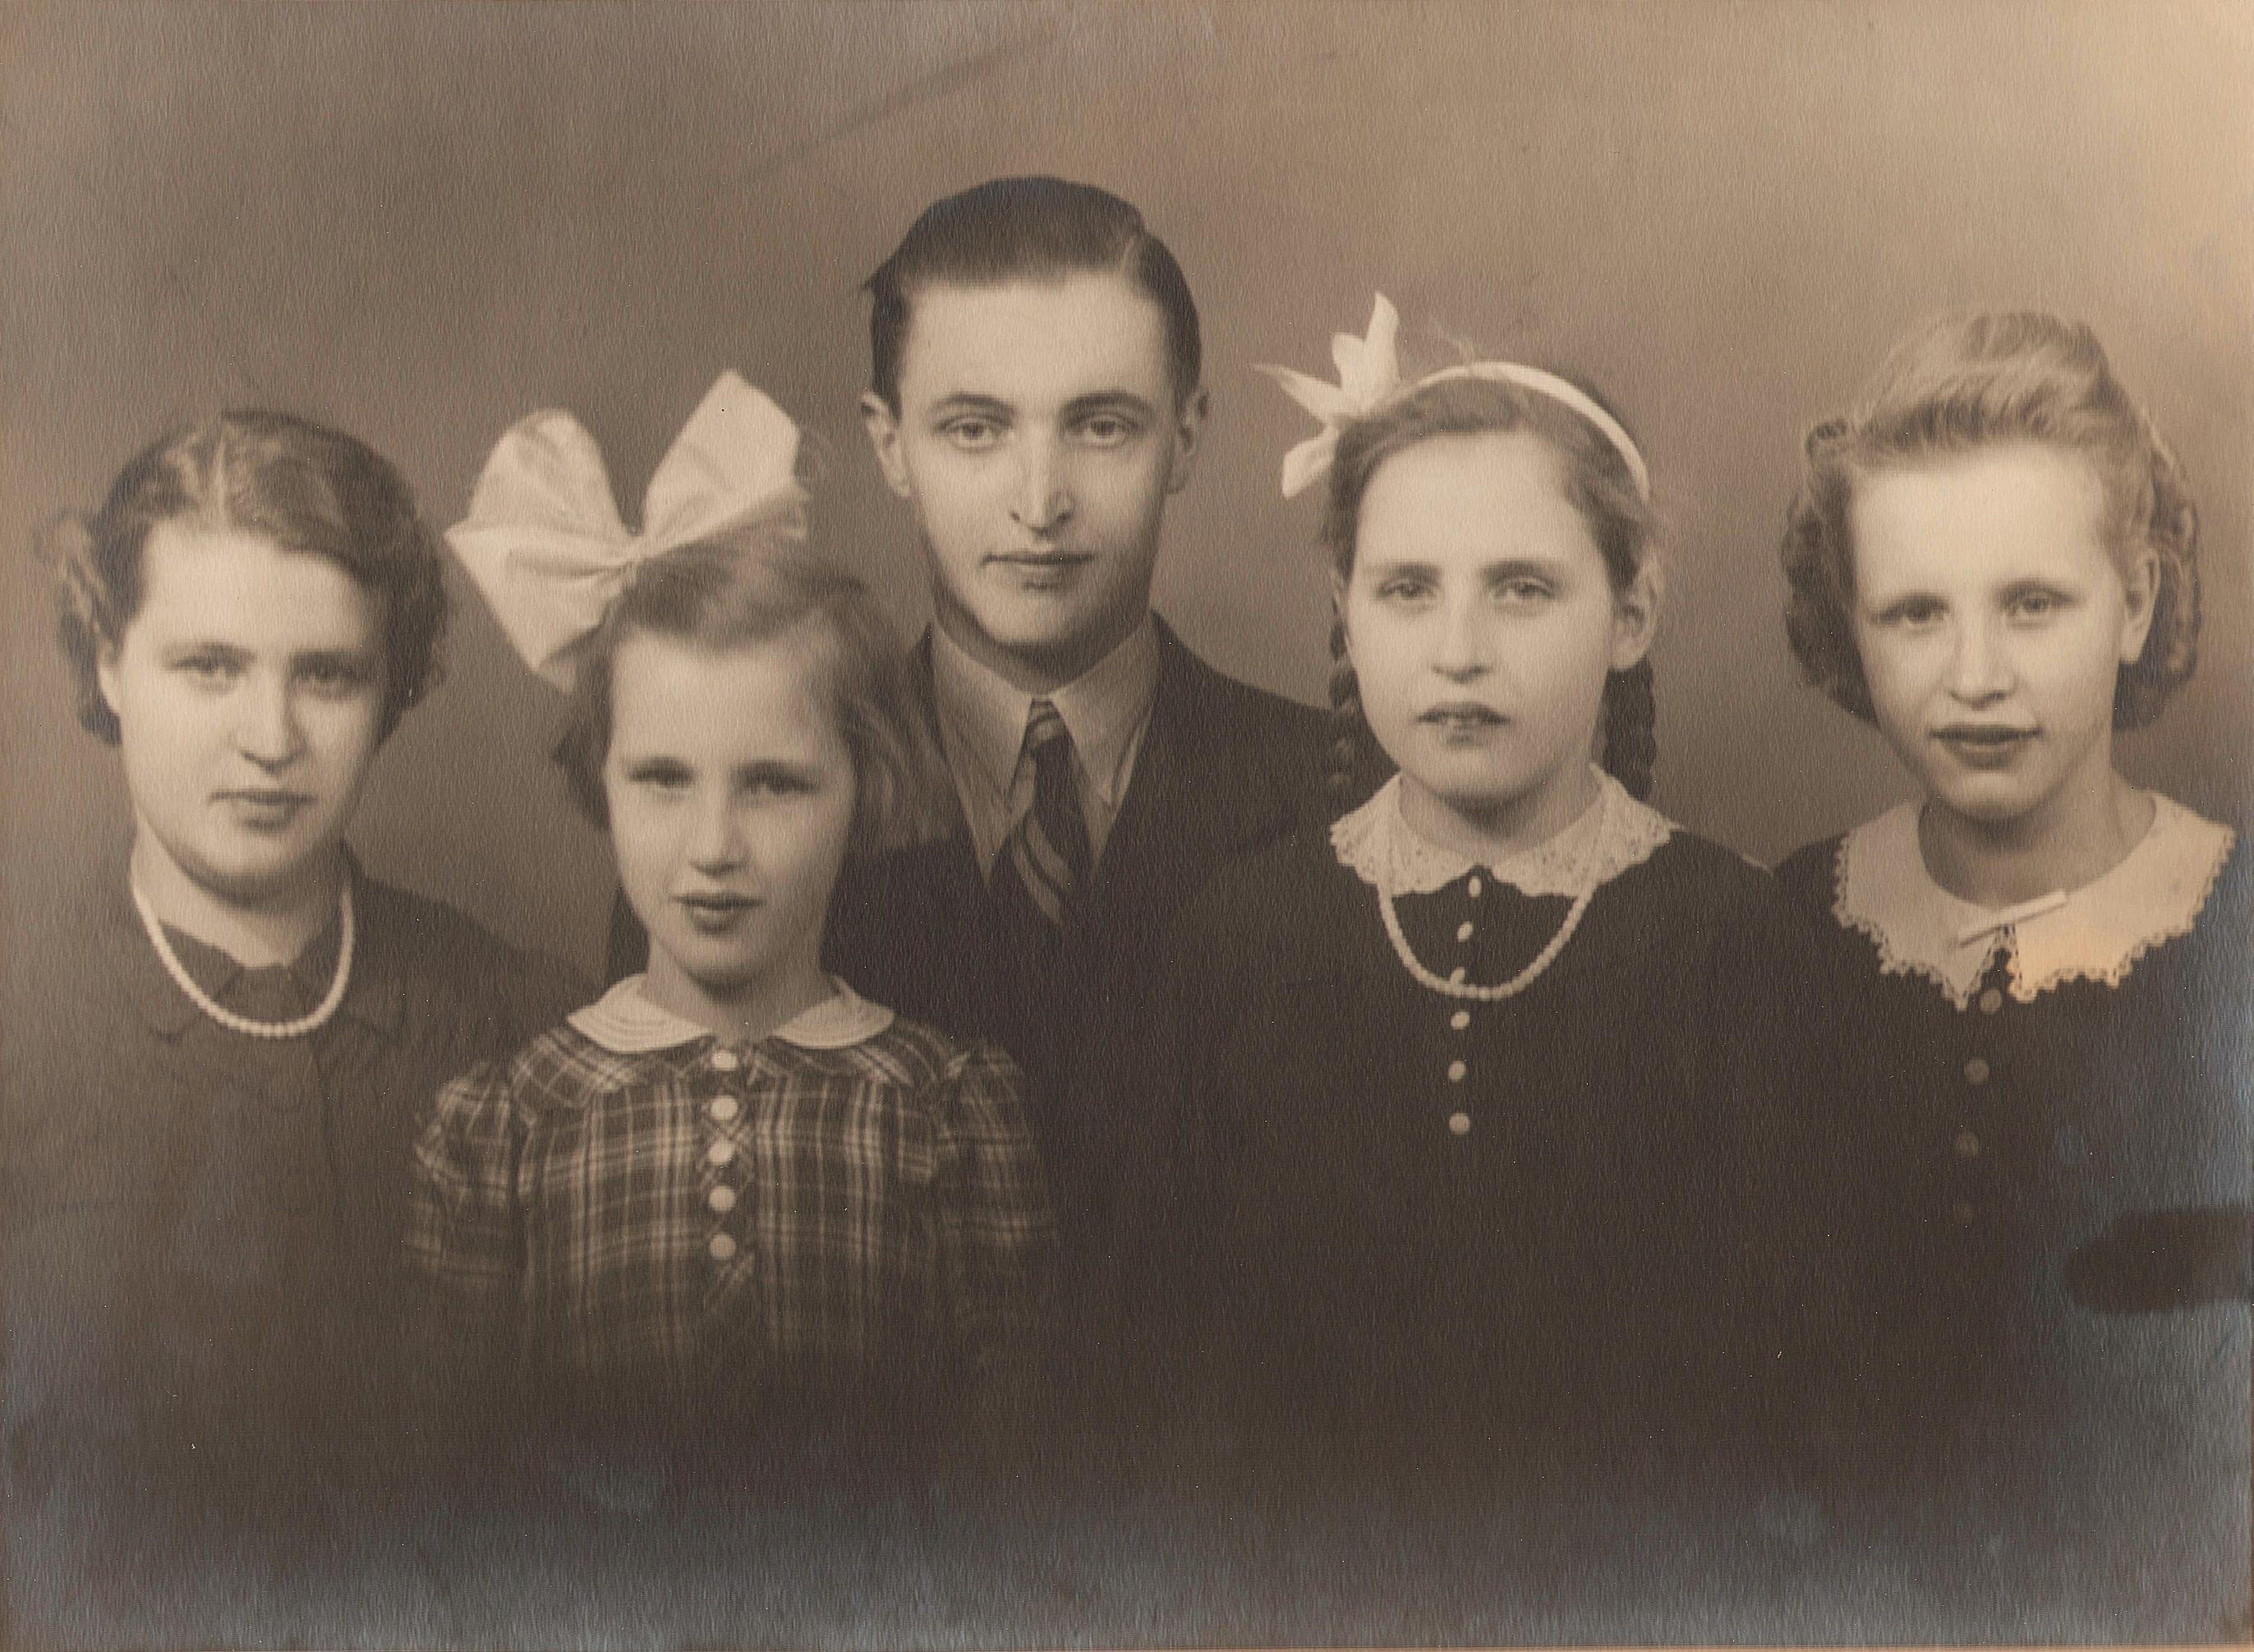 Geertruida Gaasbeek (1921-2002), Gijsberta Bernardina Gaasbeek (1933-2013), Hendrik Gaasbeek (1920-1990), Wilhelmina Gijsberta Gaasbeek (1929-2005), Gerarda Wilhelmina Gaasbeek (1928-2015)